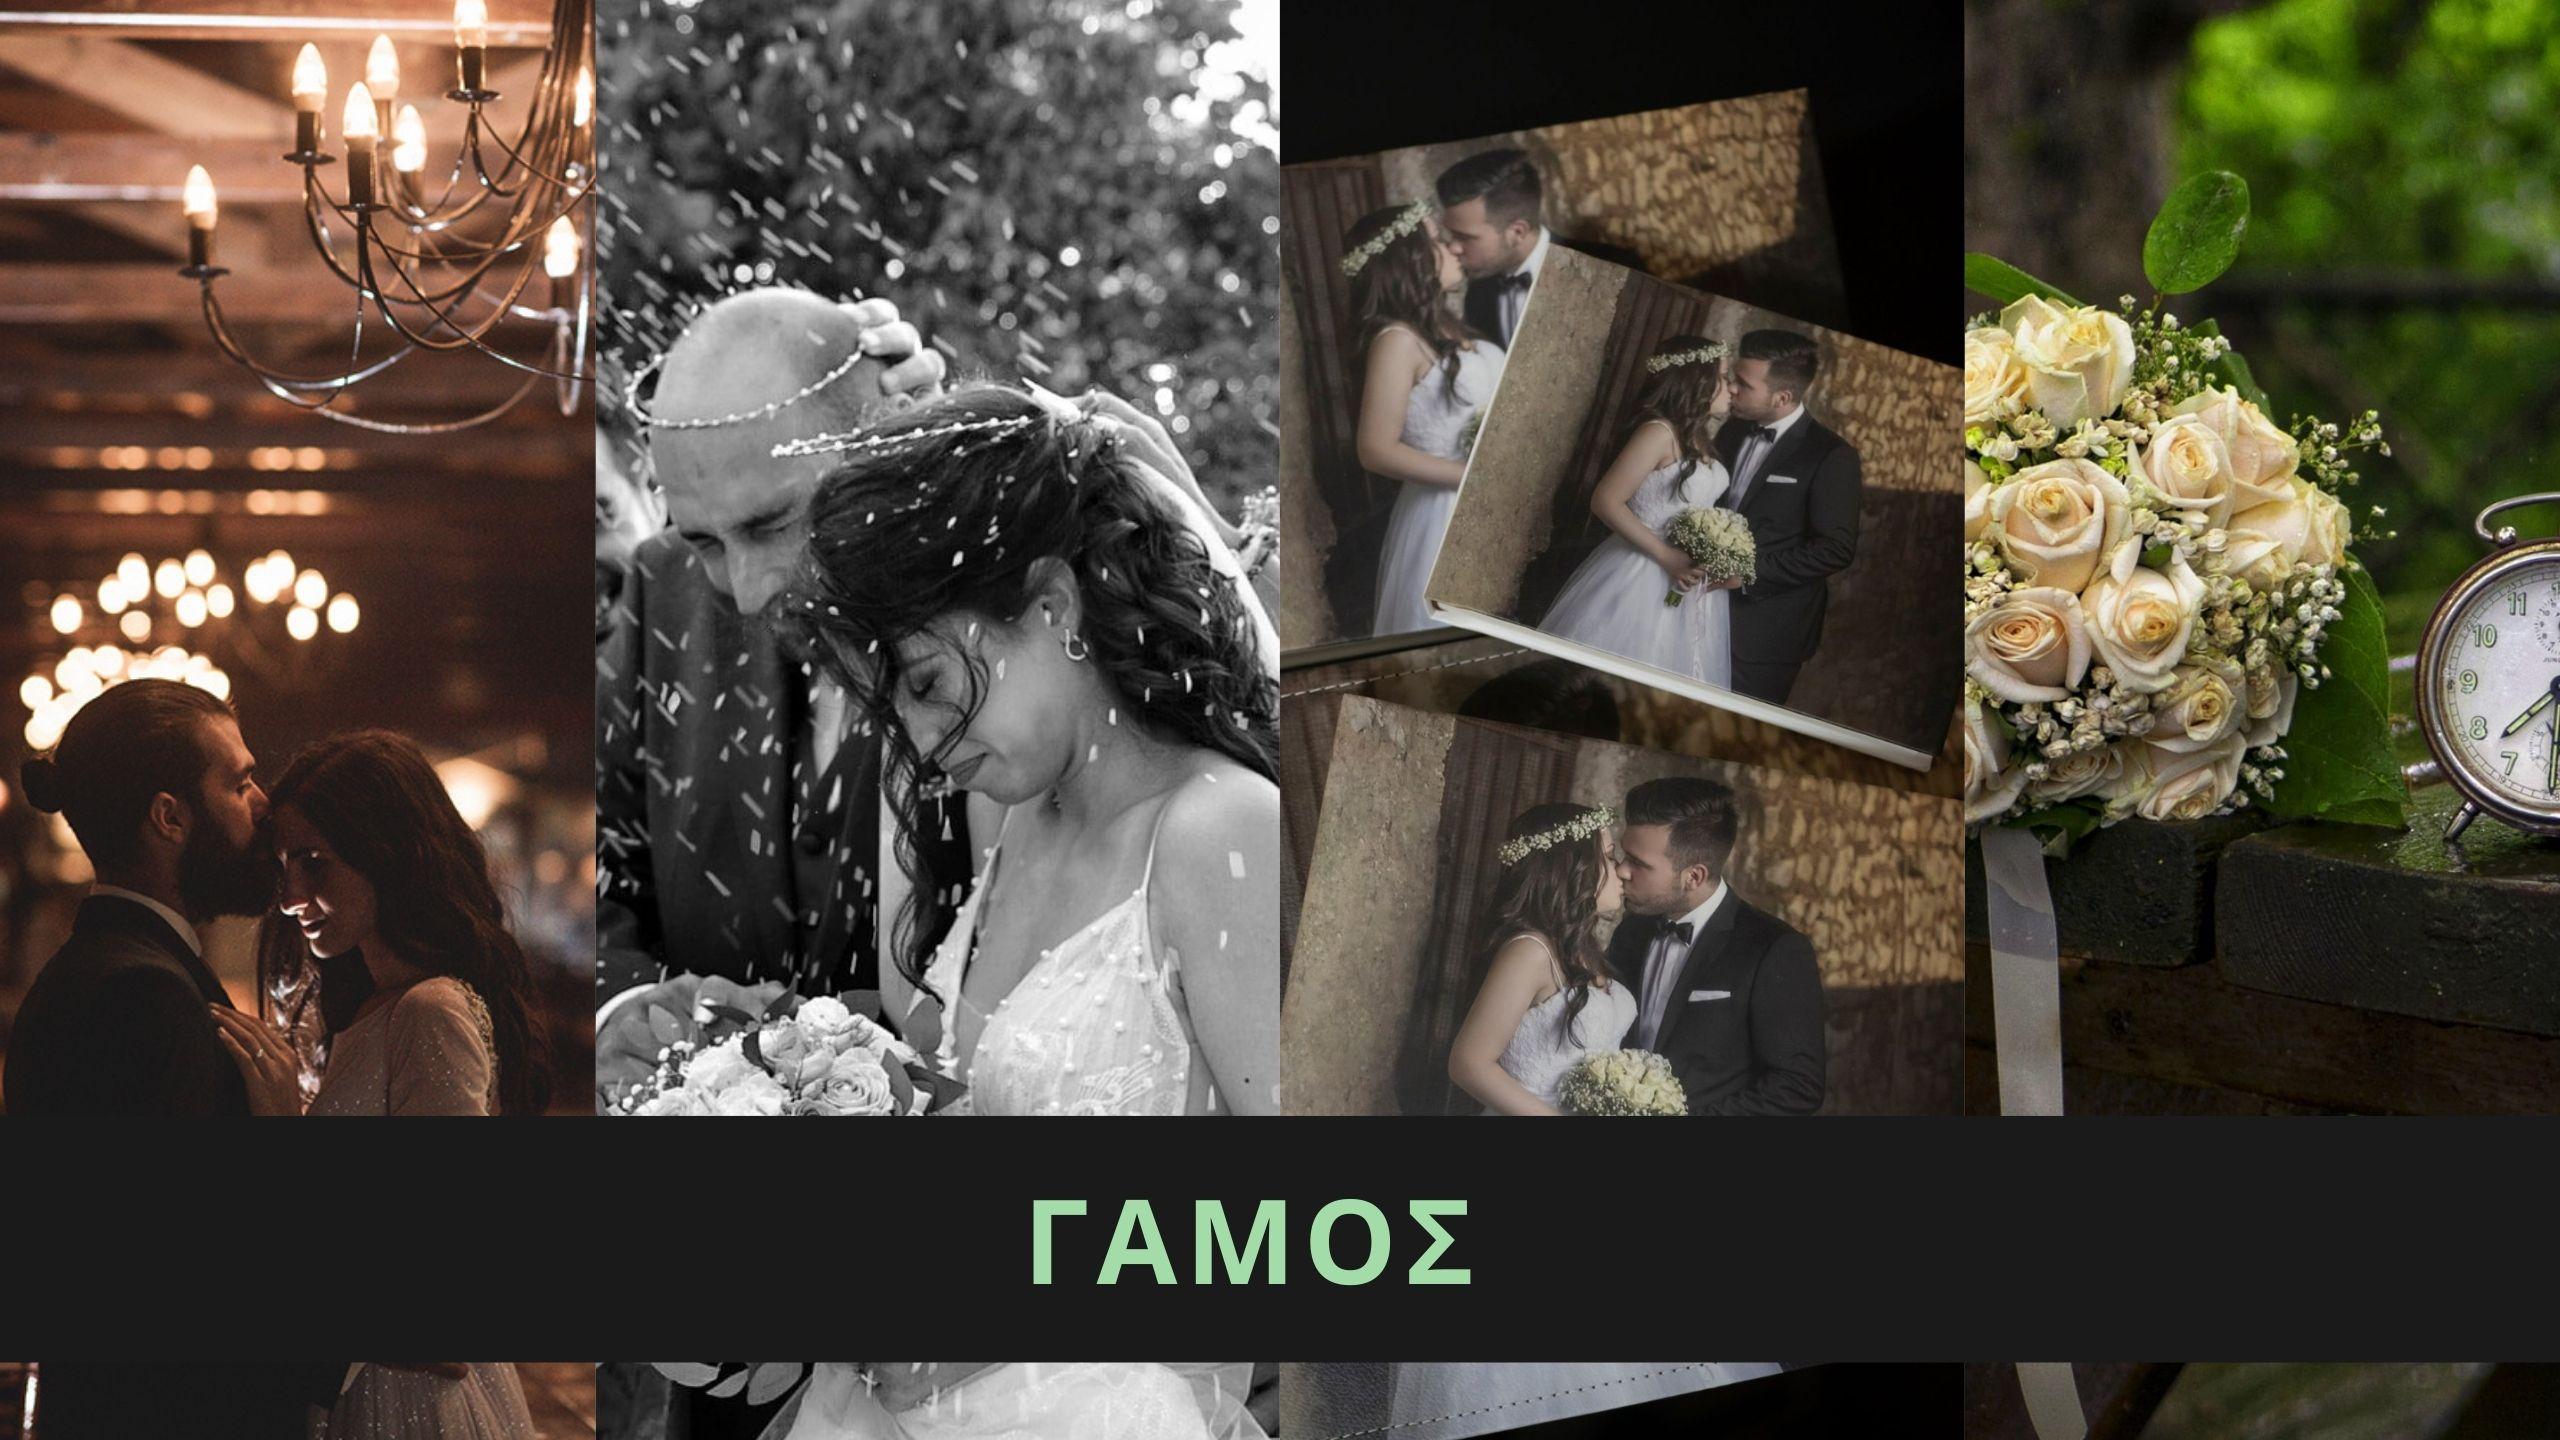 Monochrome Photo Collage Tutorial YouTube Channel Art (24)